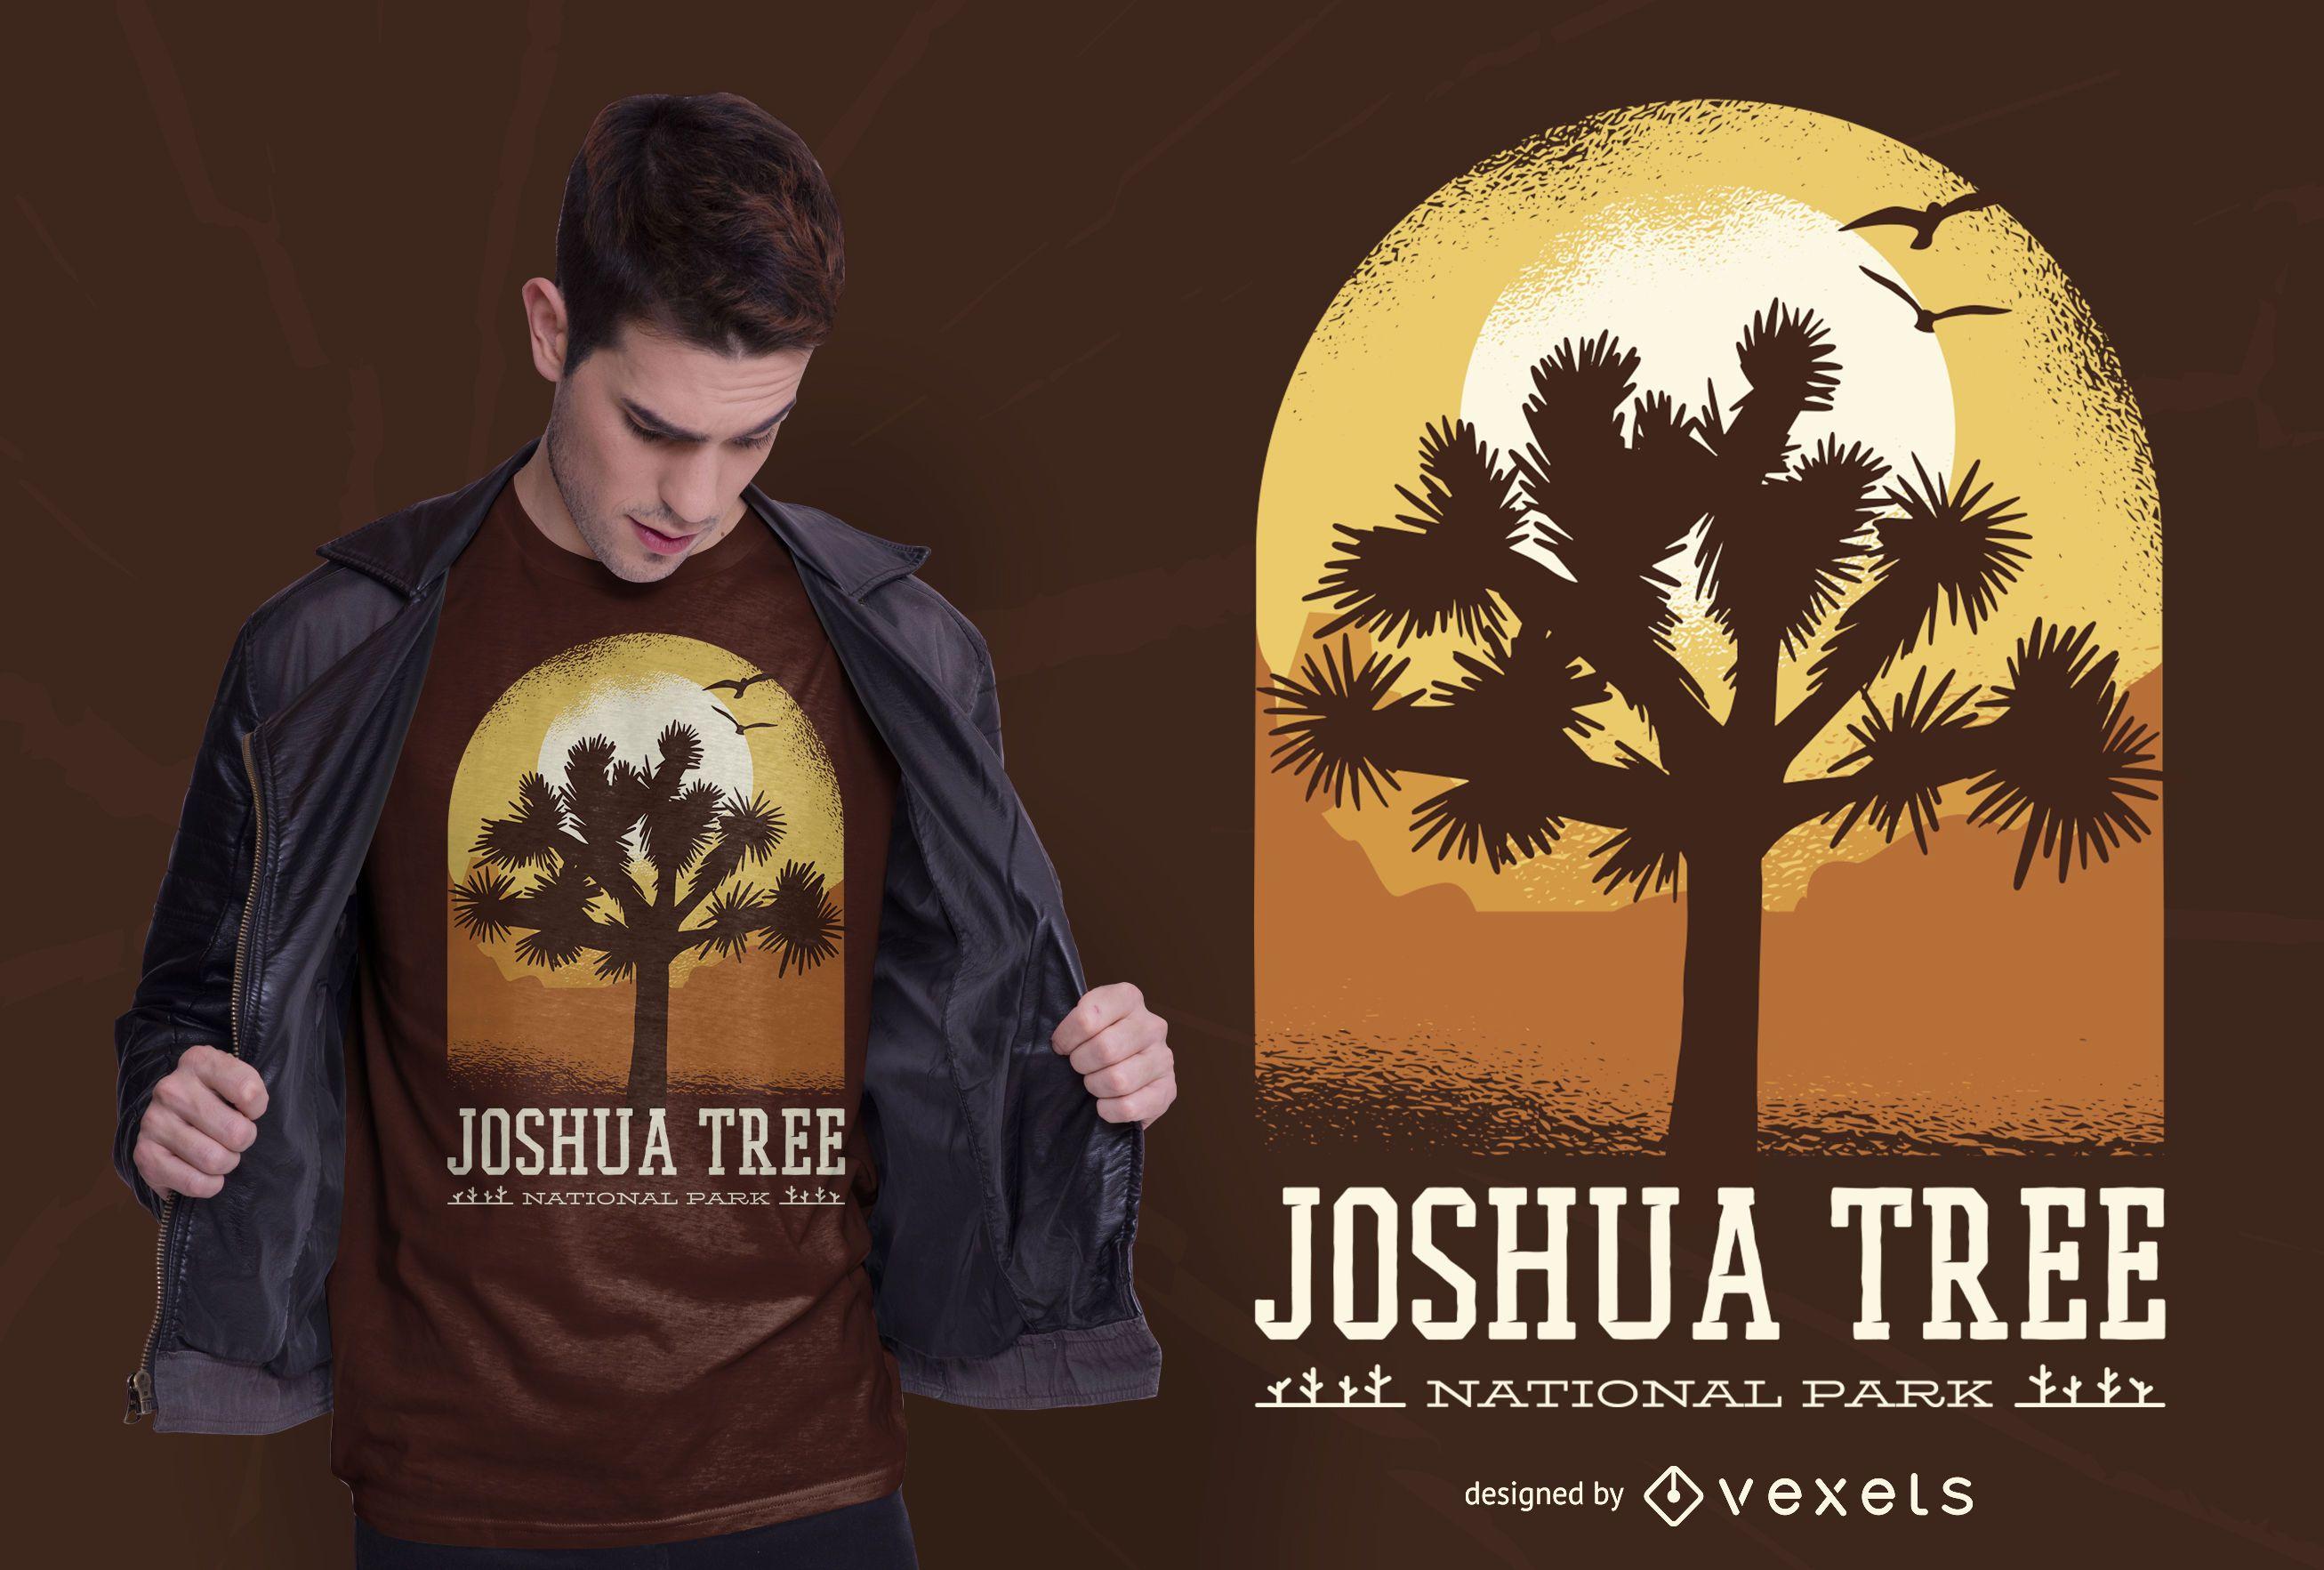 Joshua tree park t-shirt design